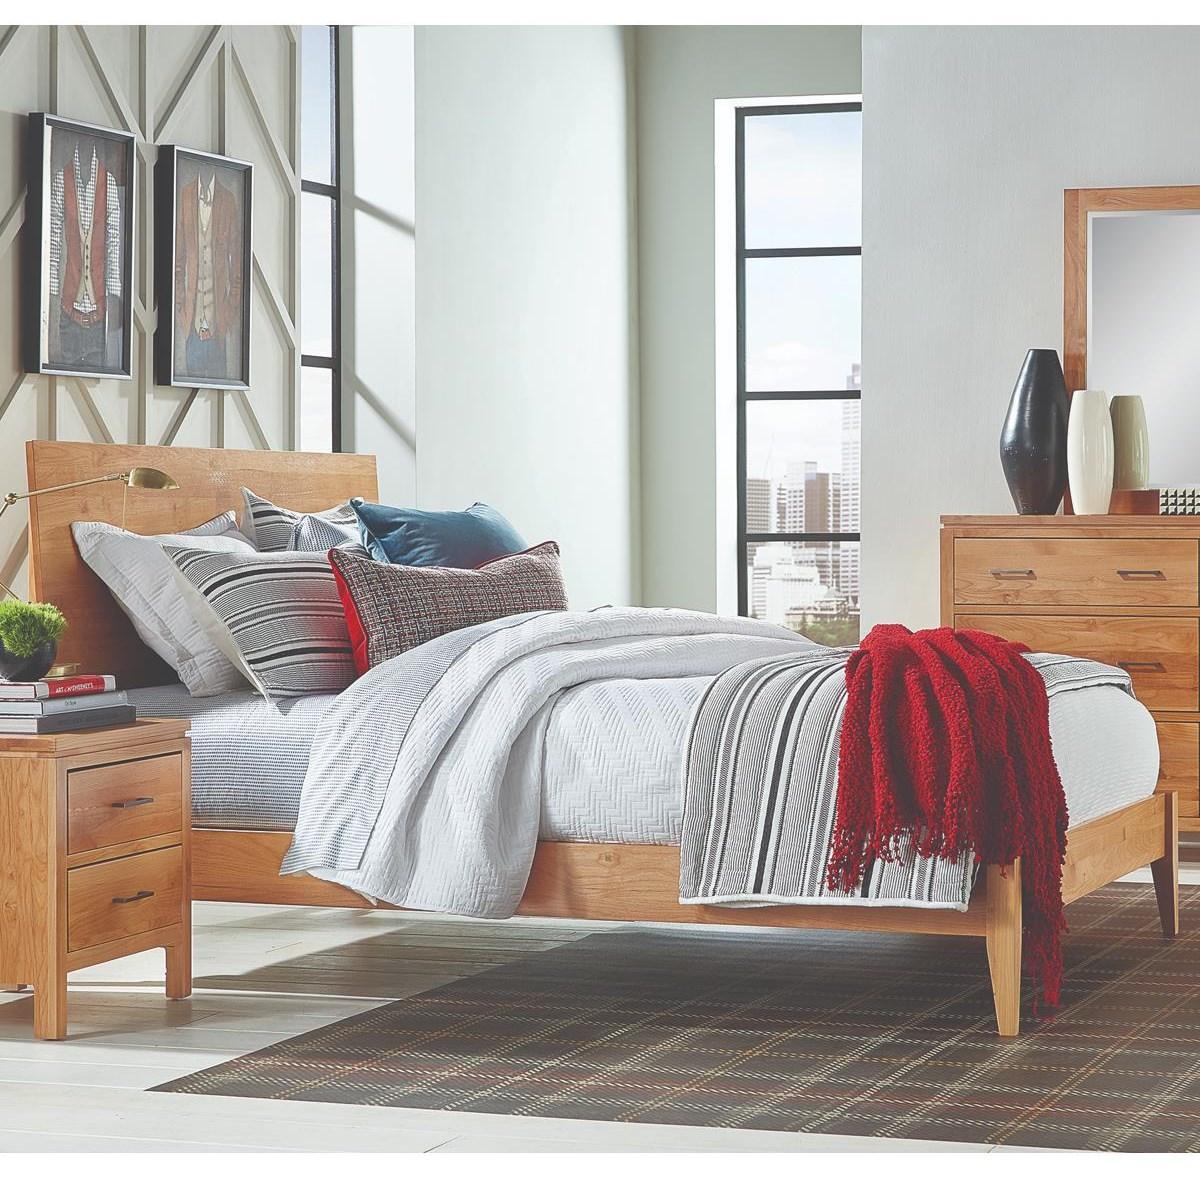 2 West Queen Platform Bed by Archbold Furniture at Belfort Furniture